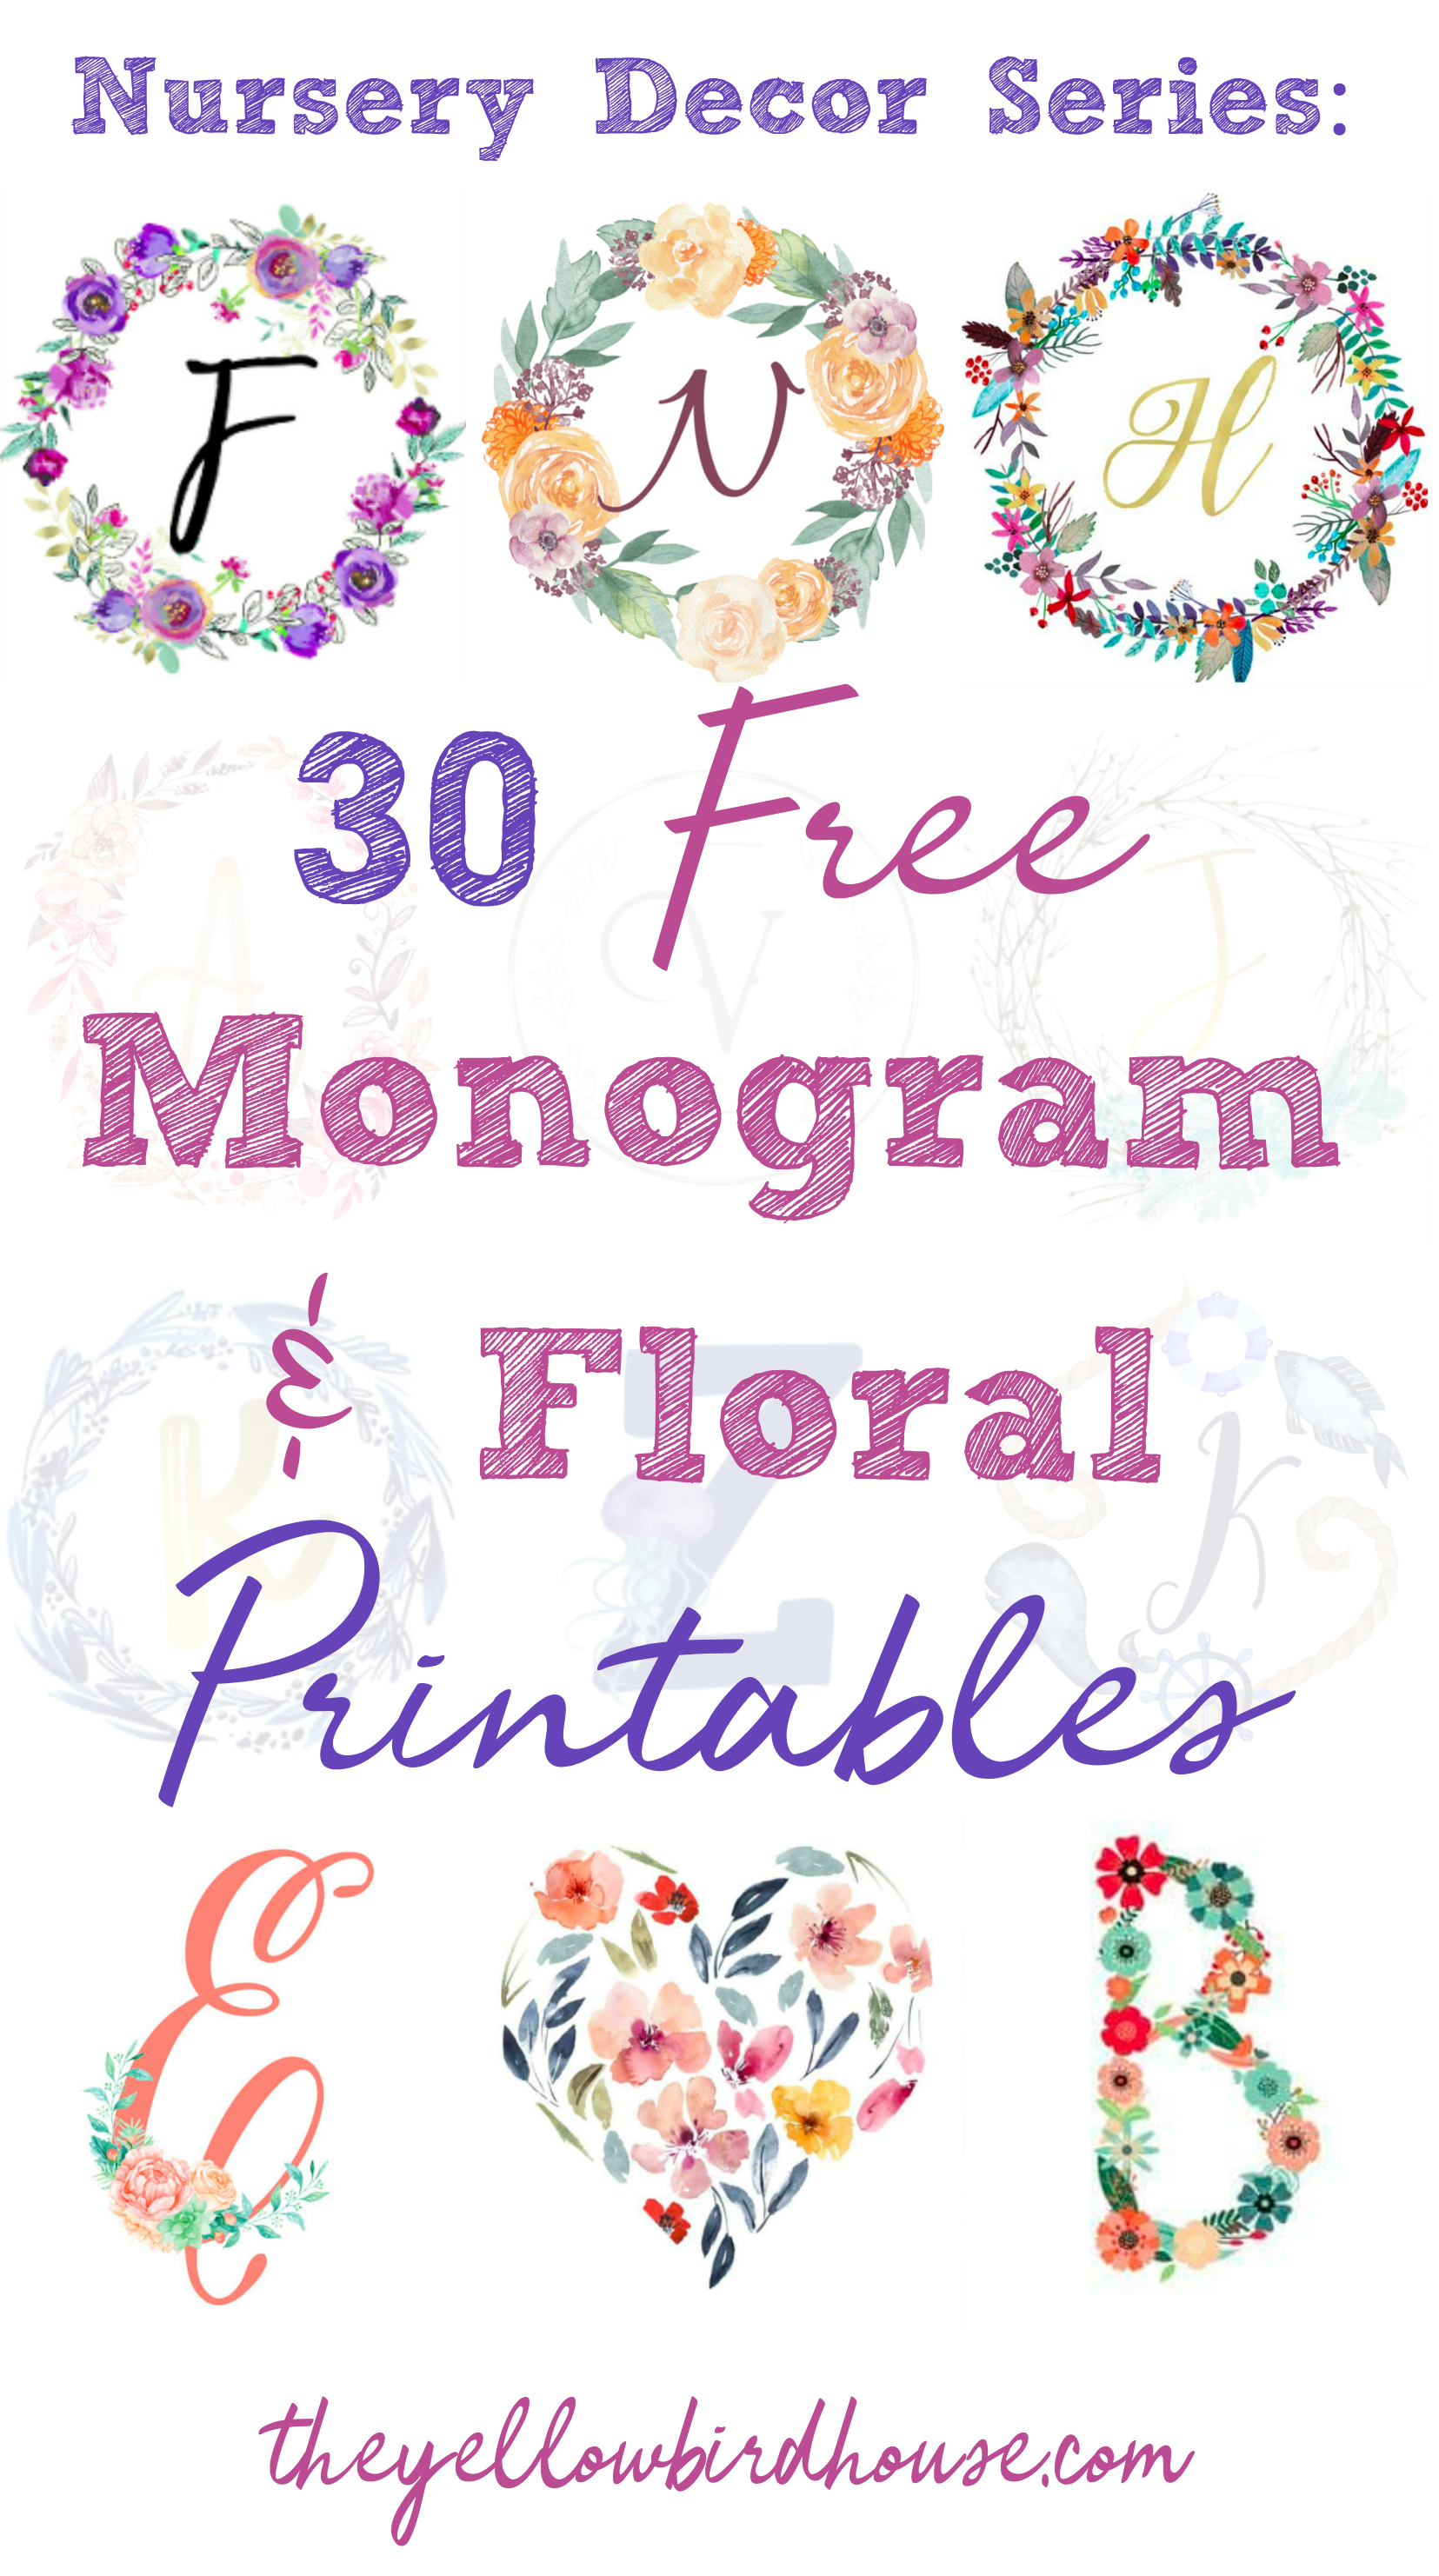 Nursery Decor Series: 30 Free Monogram Printables - Free Printable Monogram Letters